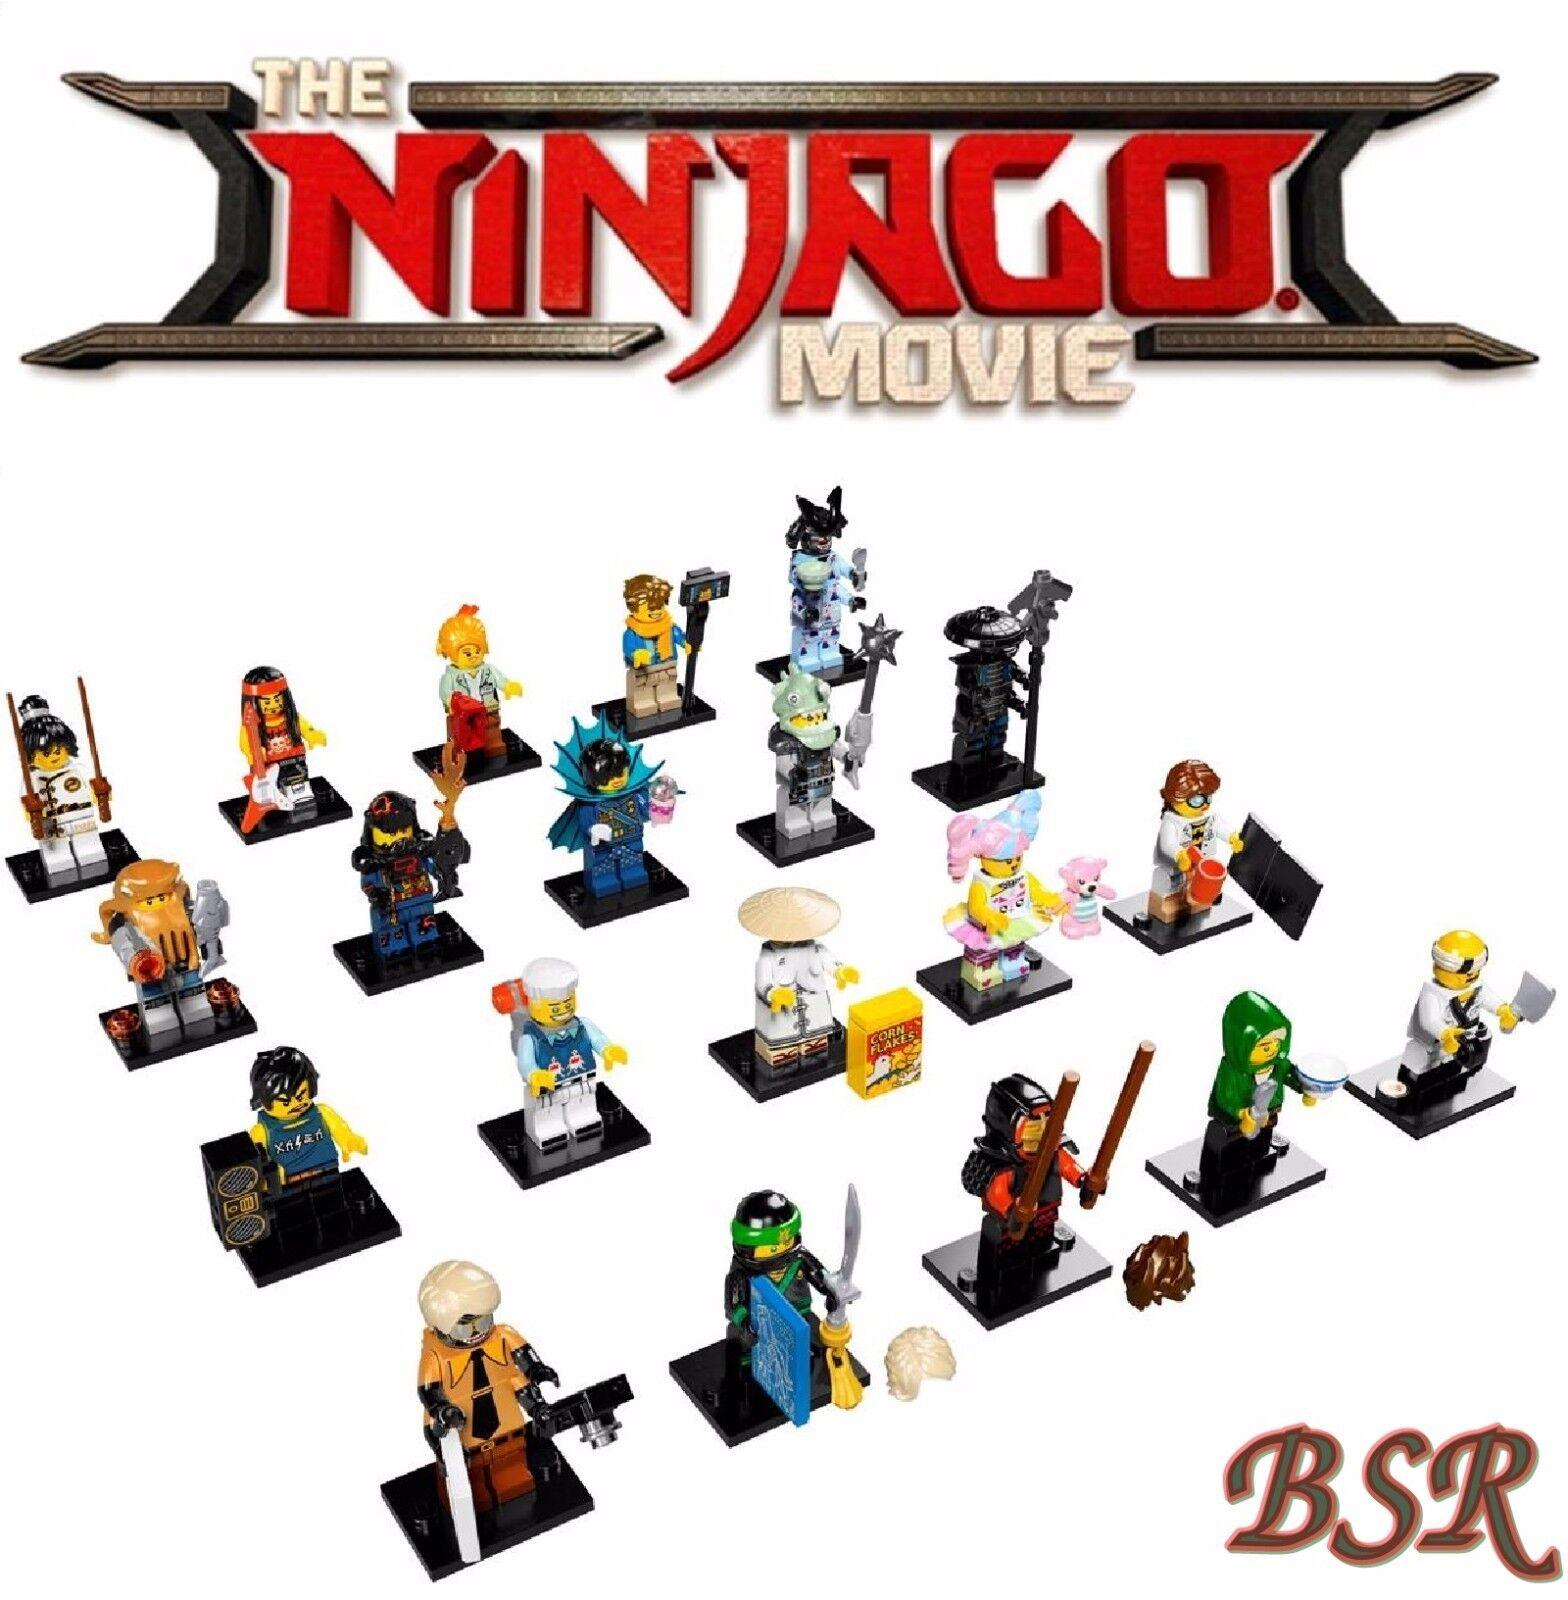 LEGO ® 71019 complet spécial-Série-Ninjago movie 20 Minifiguren  NOUVEAU